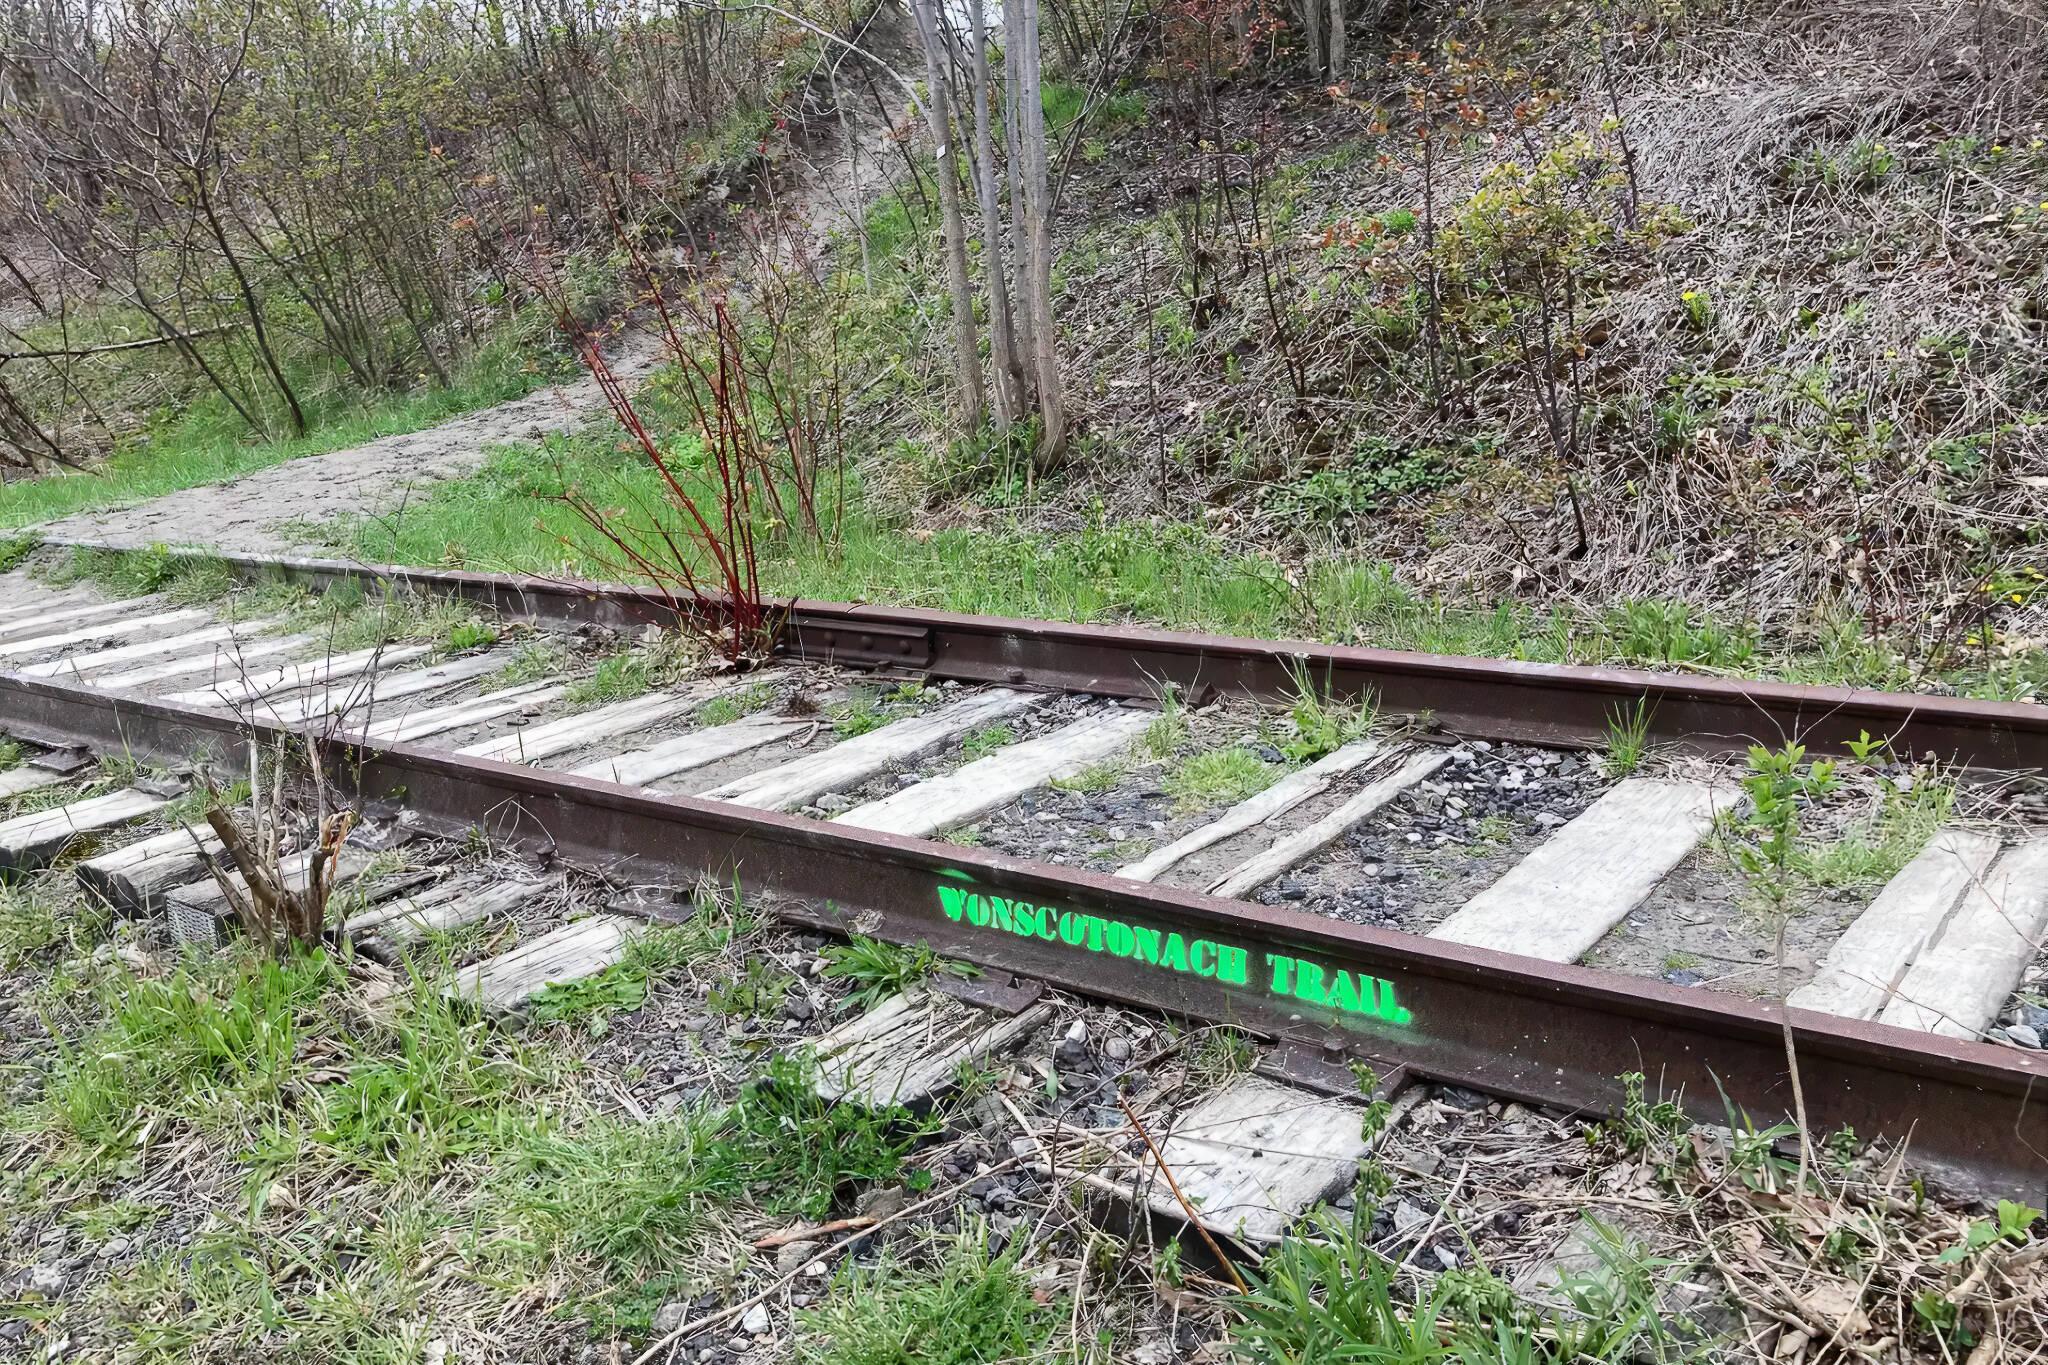 wonscotonach trail toronto